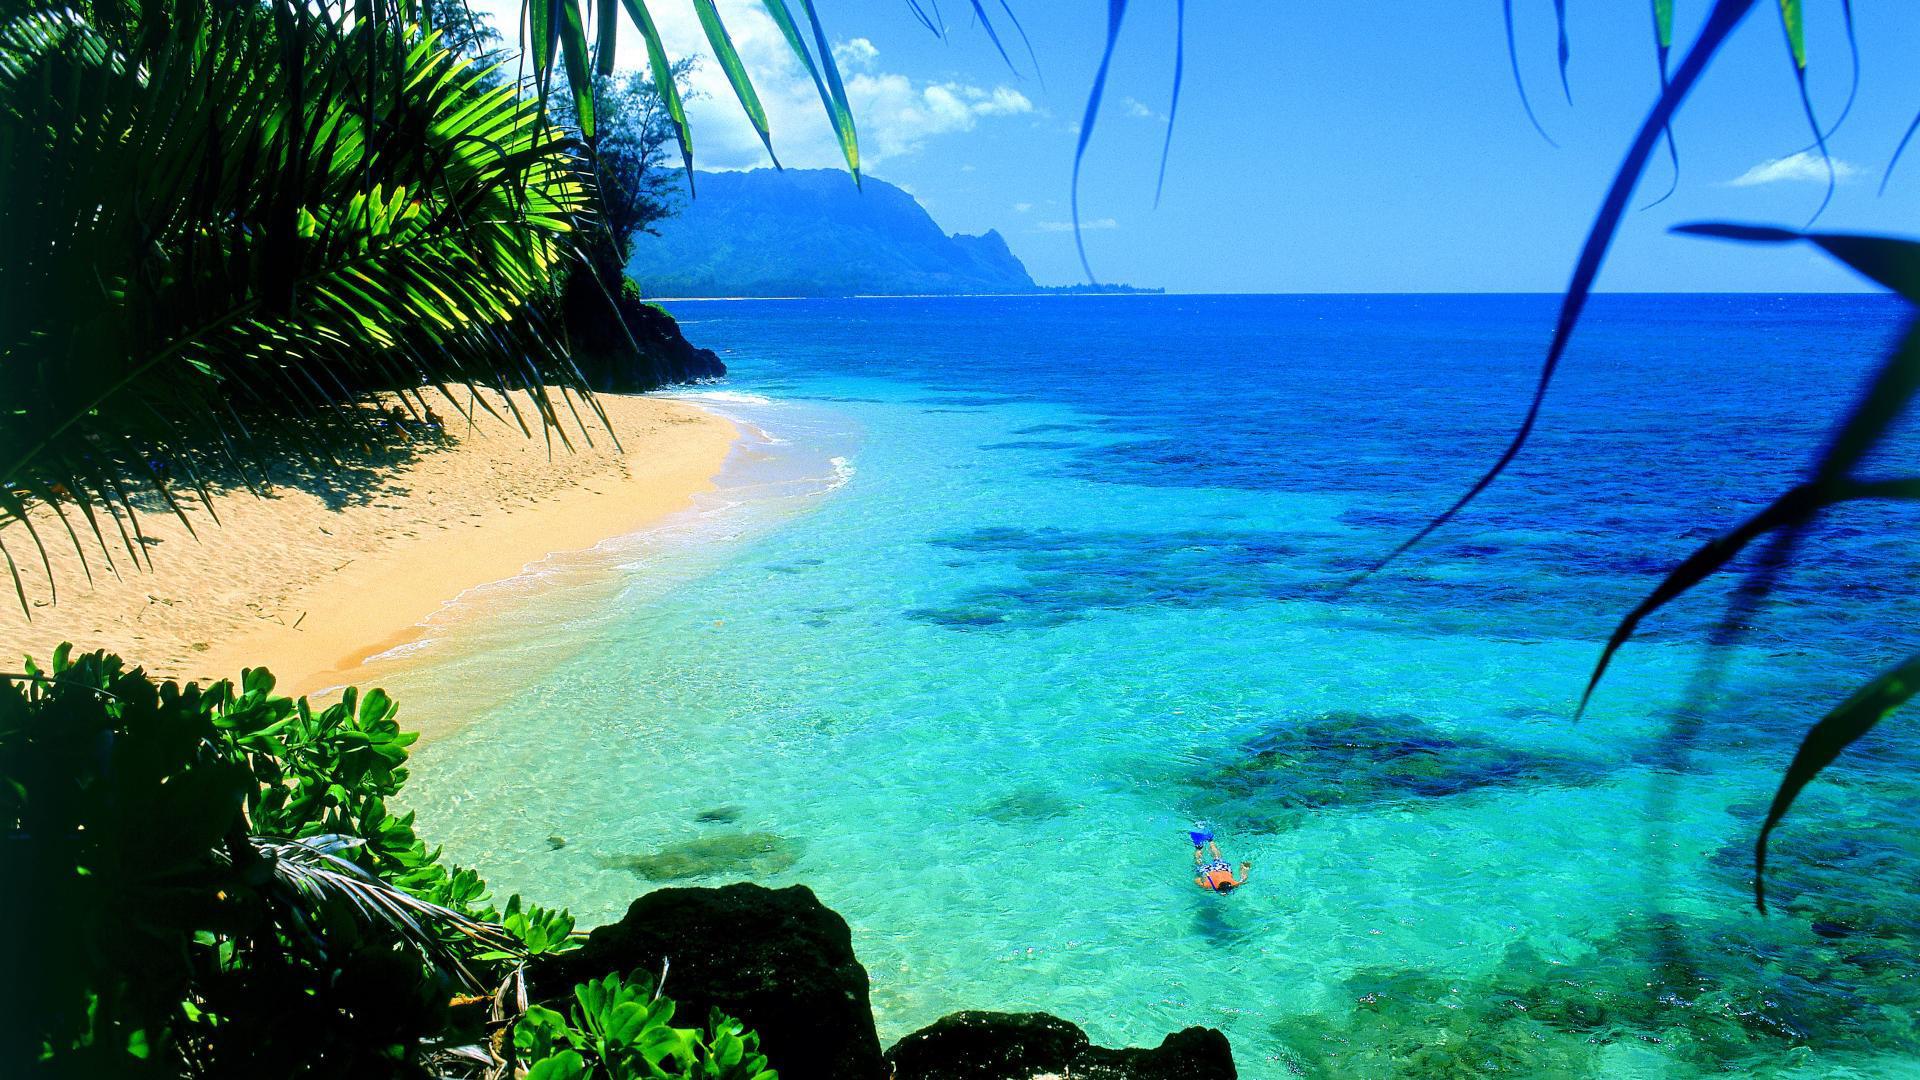 Hd wallpaper travel - Hawaii Snorkel Travel High Definition Widescre 9284 Wallpaper